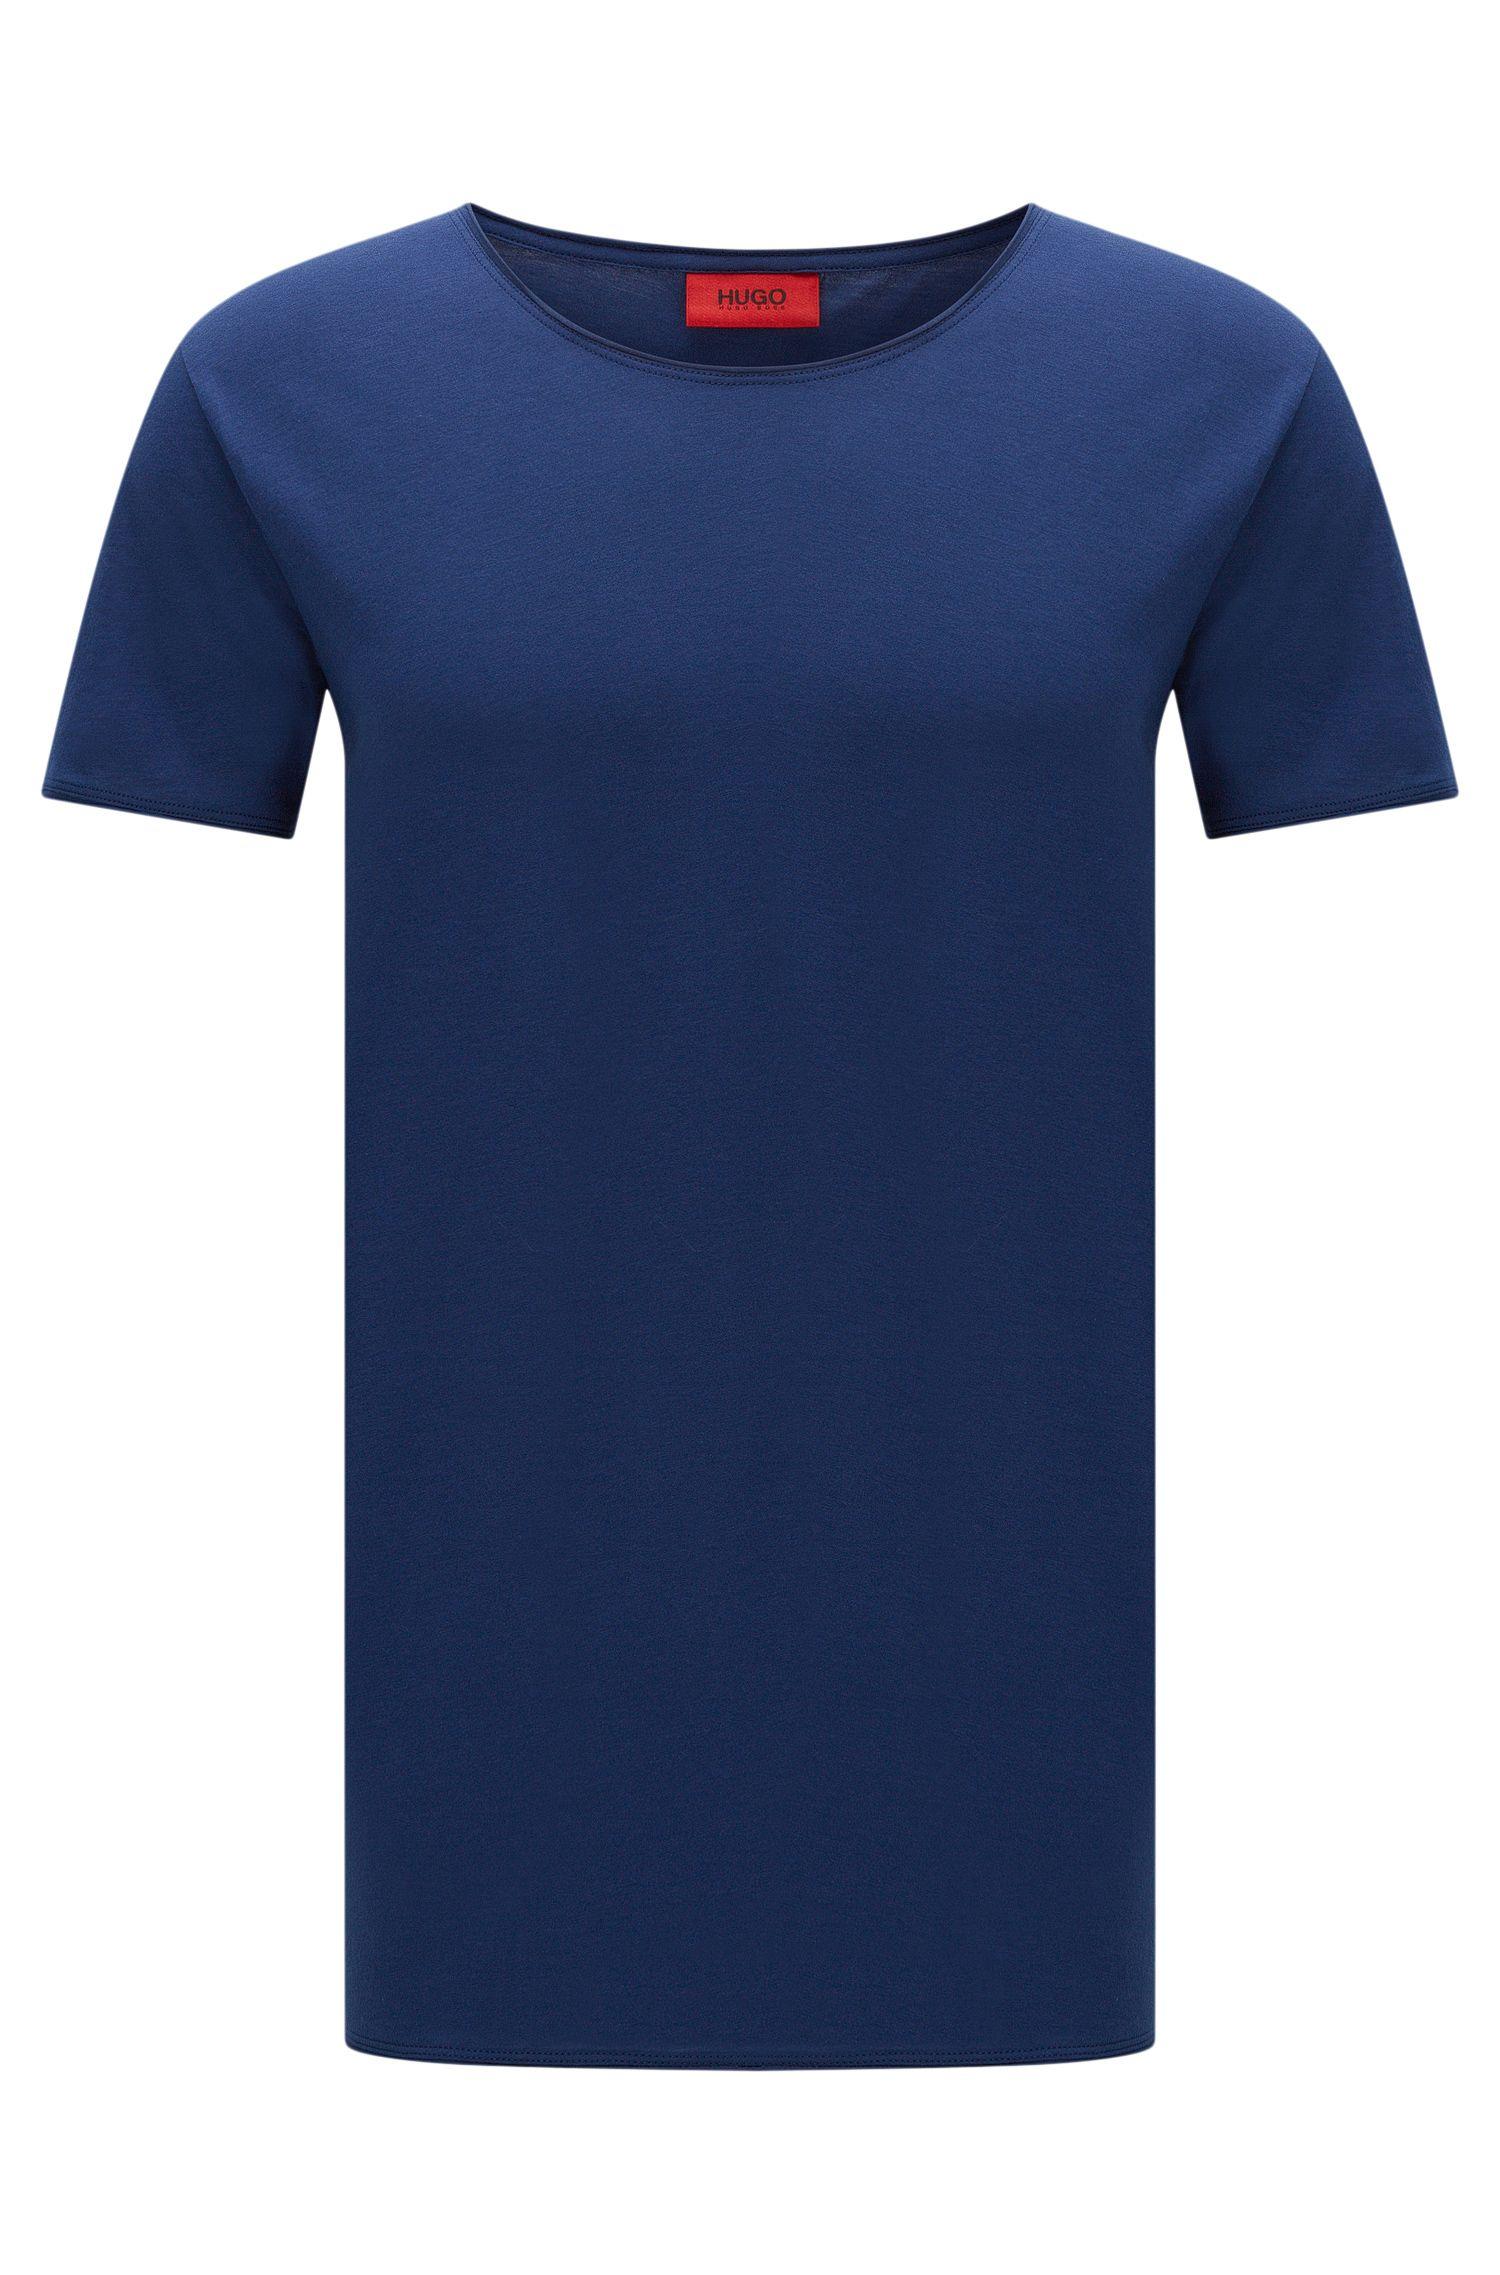 Camiseta relaxed fit en algodón supima